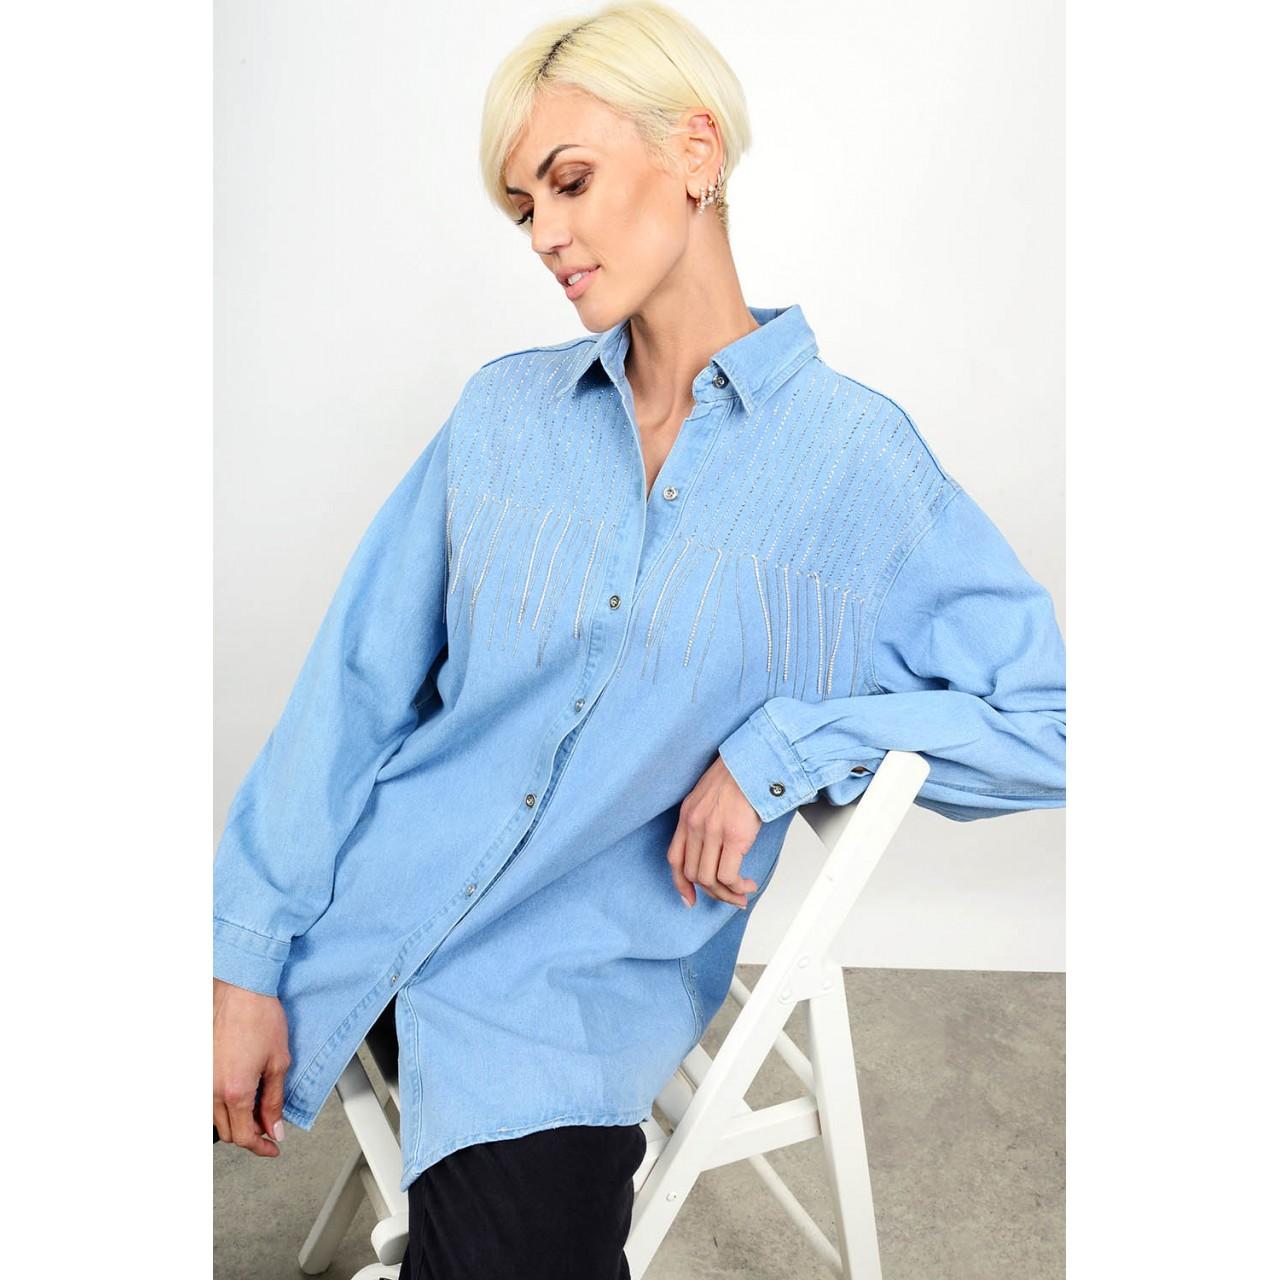 98.Oversized πουκάμισο τζιν με στρας Limited Edition